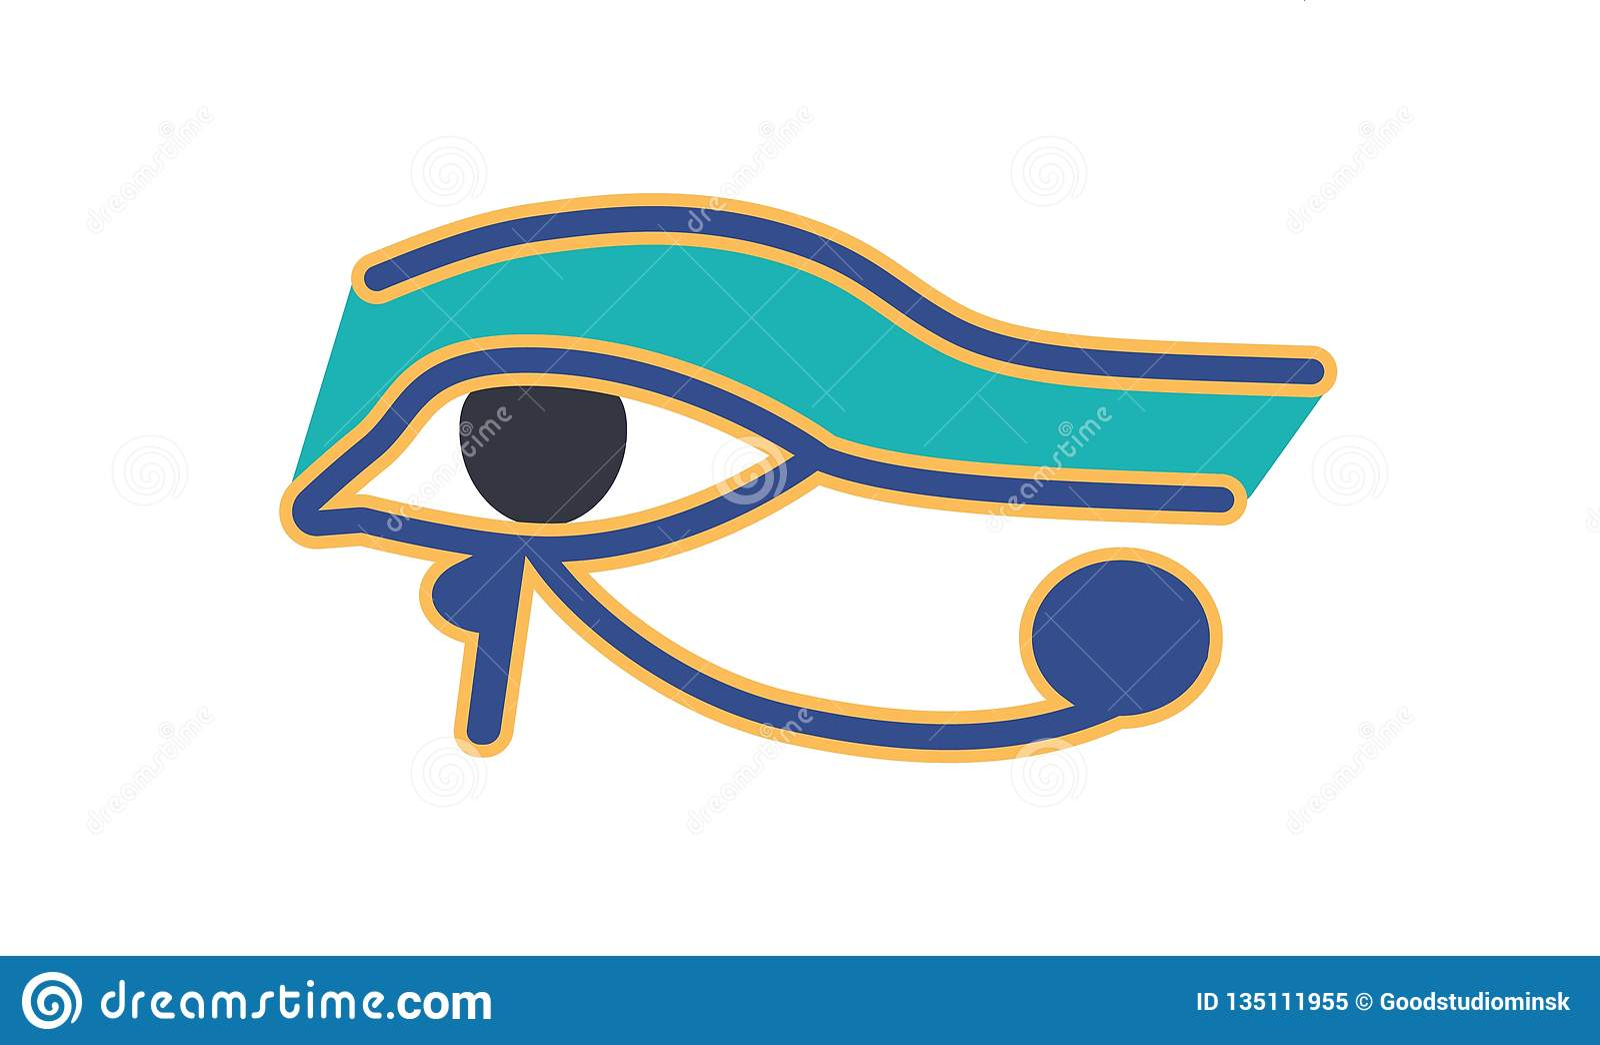 Eye Of Horus Or Wadjet, Ancient Egyptian Hieroglyphic Sign